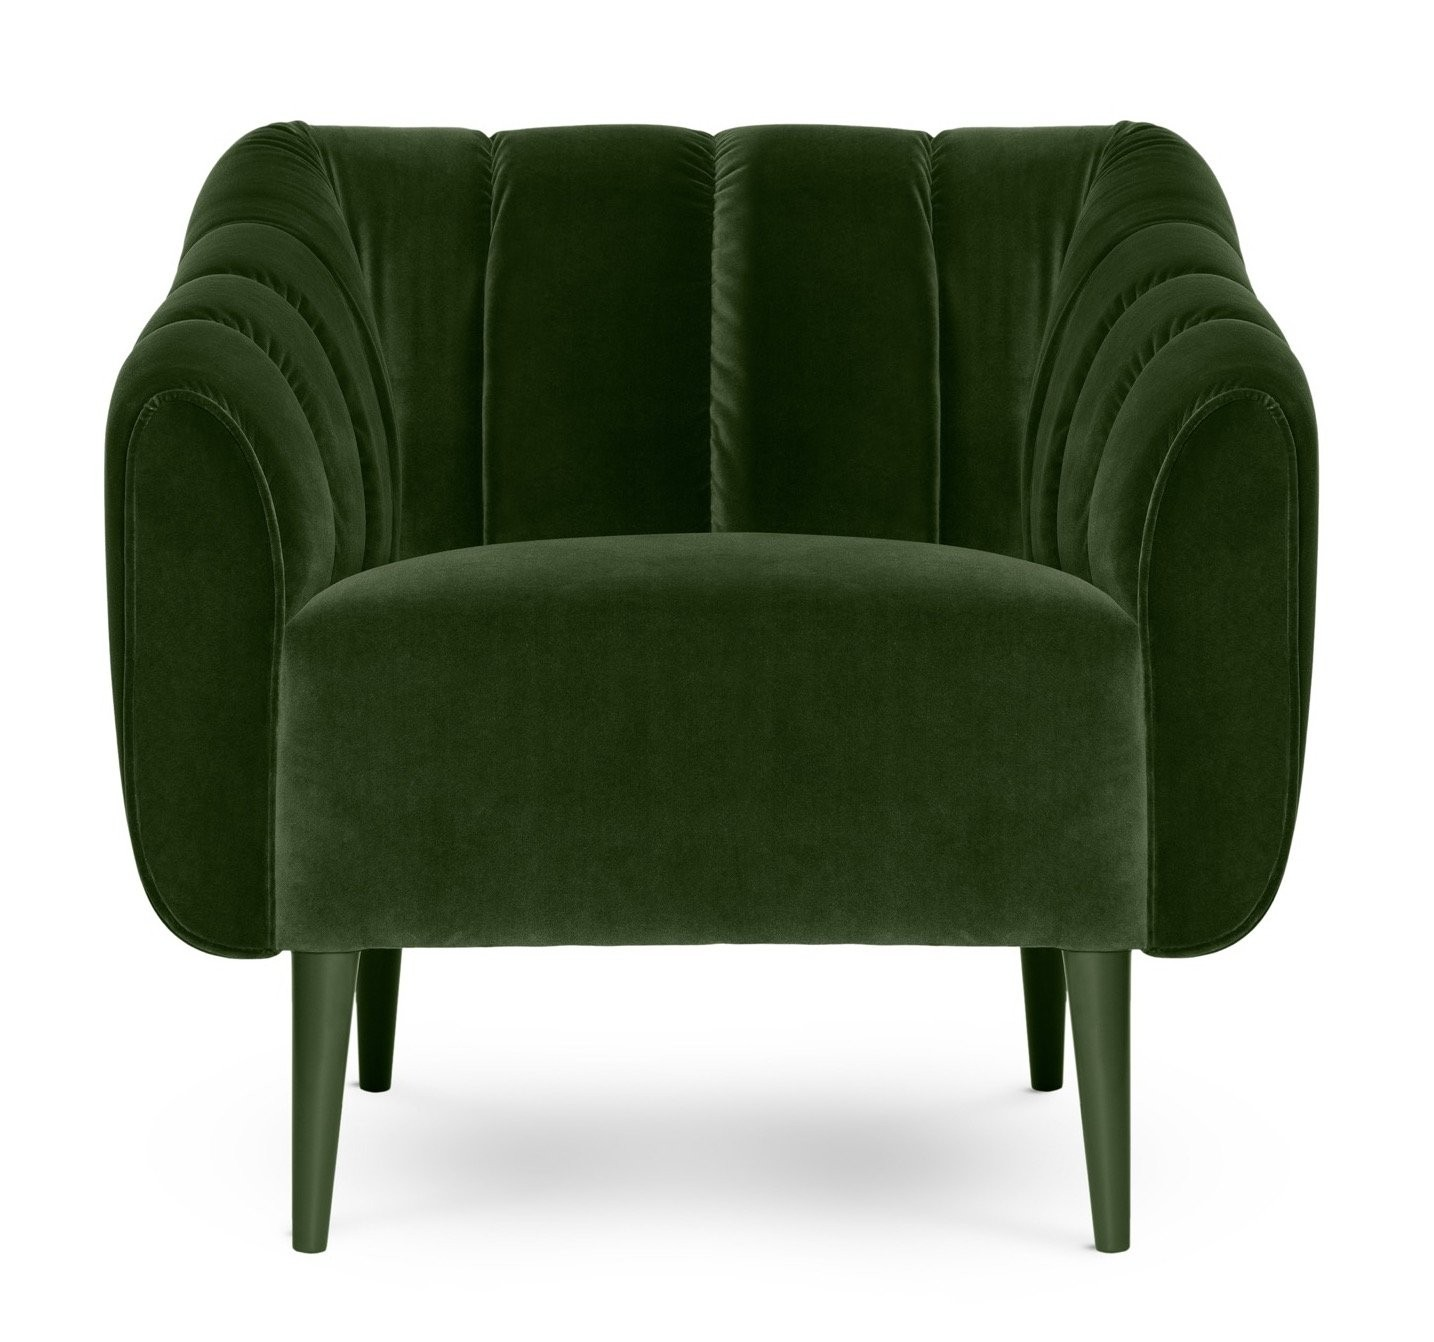 Munna Houston Arm Chair Shop Now